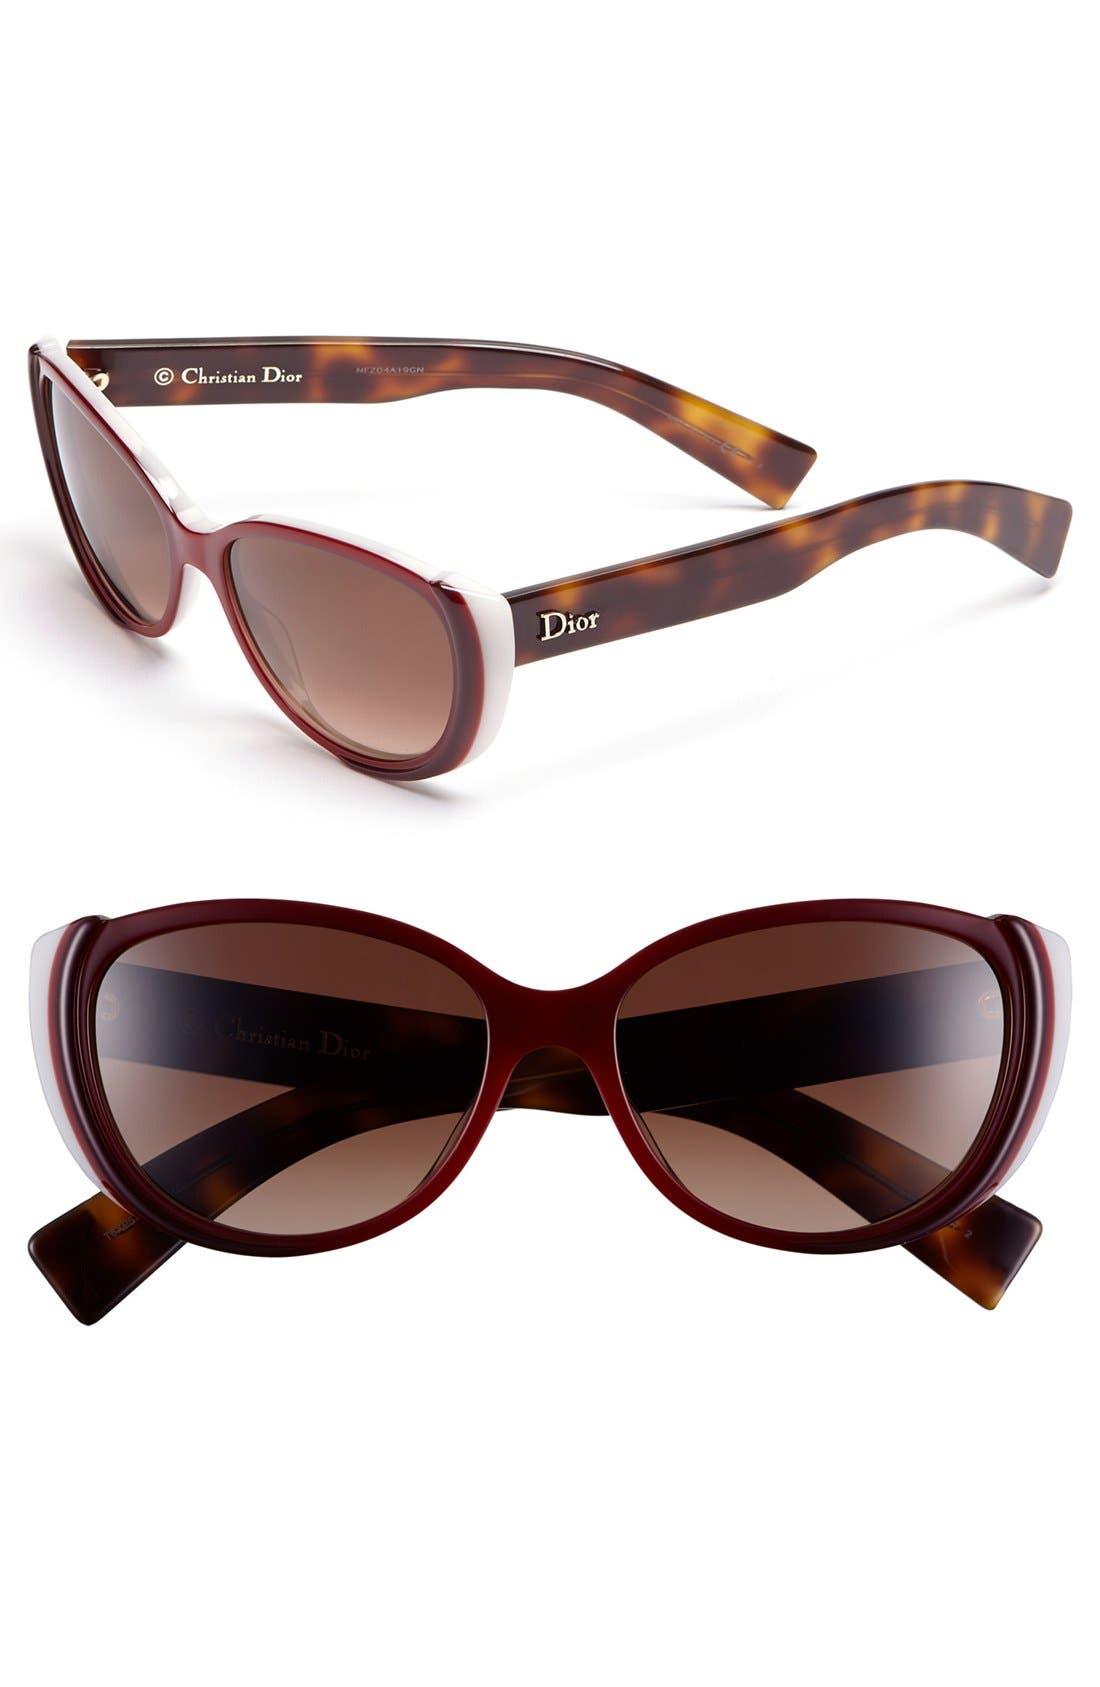 Main Image - Dior 'Summer 2' 55mm Retro Sunglasses